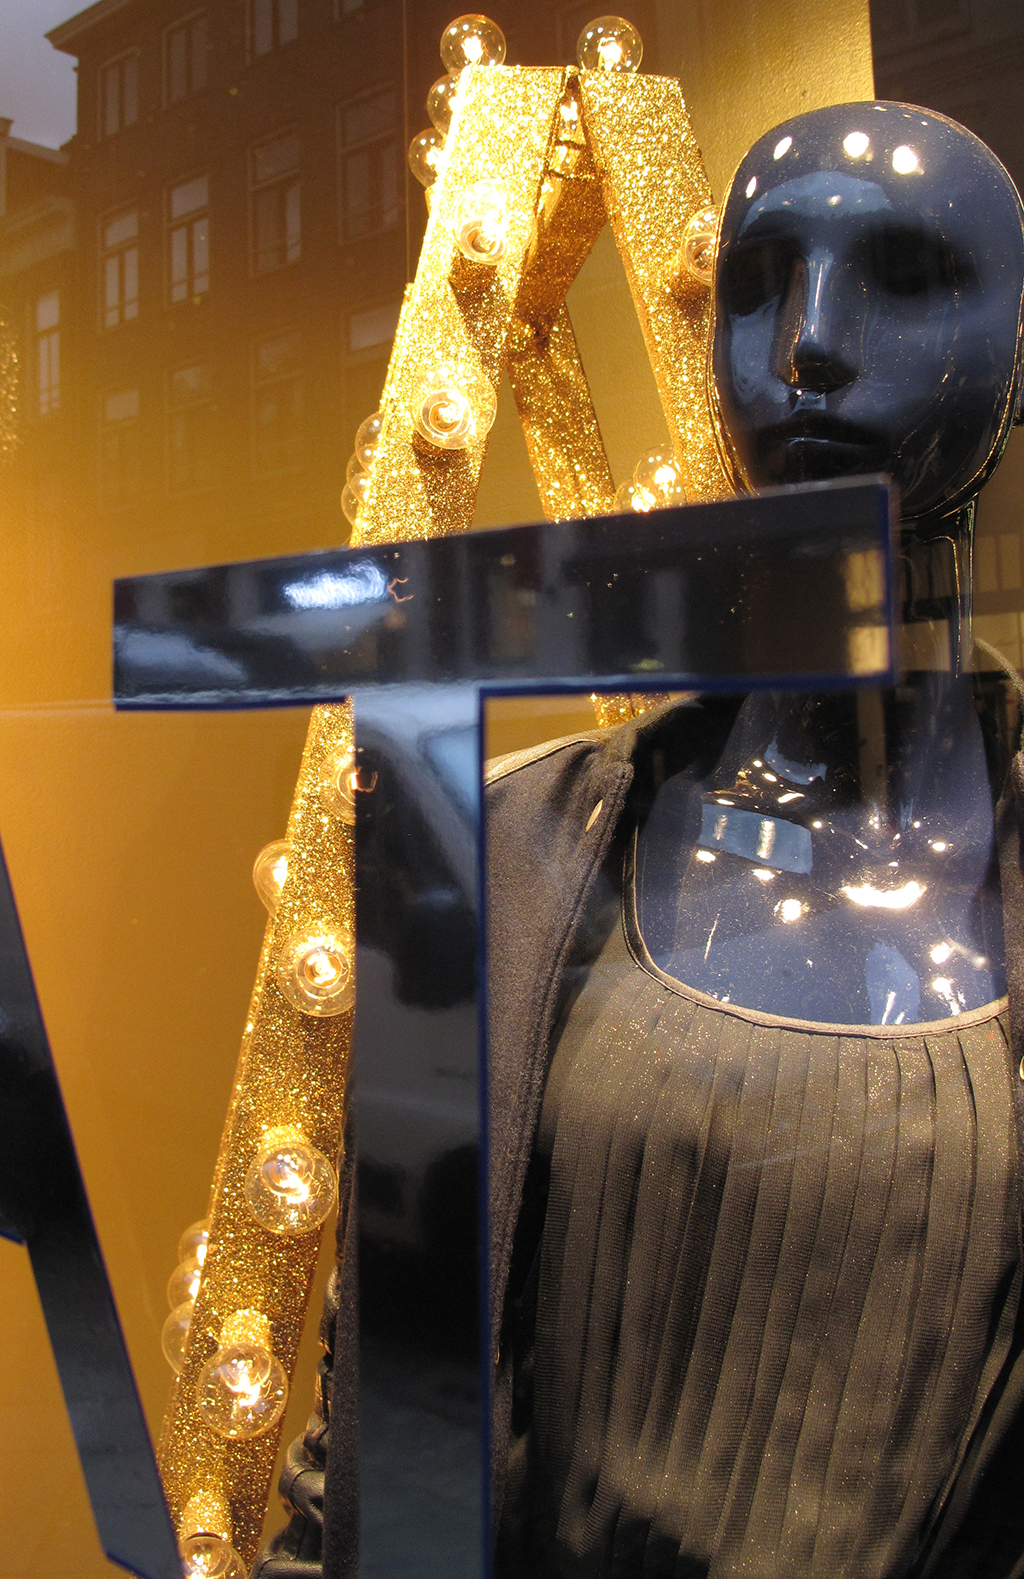 Hilfiger Denim Quot Gold Amp Black Quot Holiday Window Display